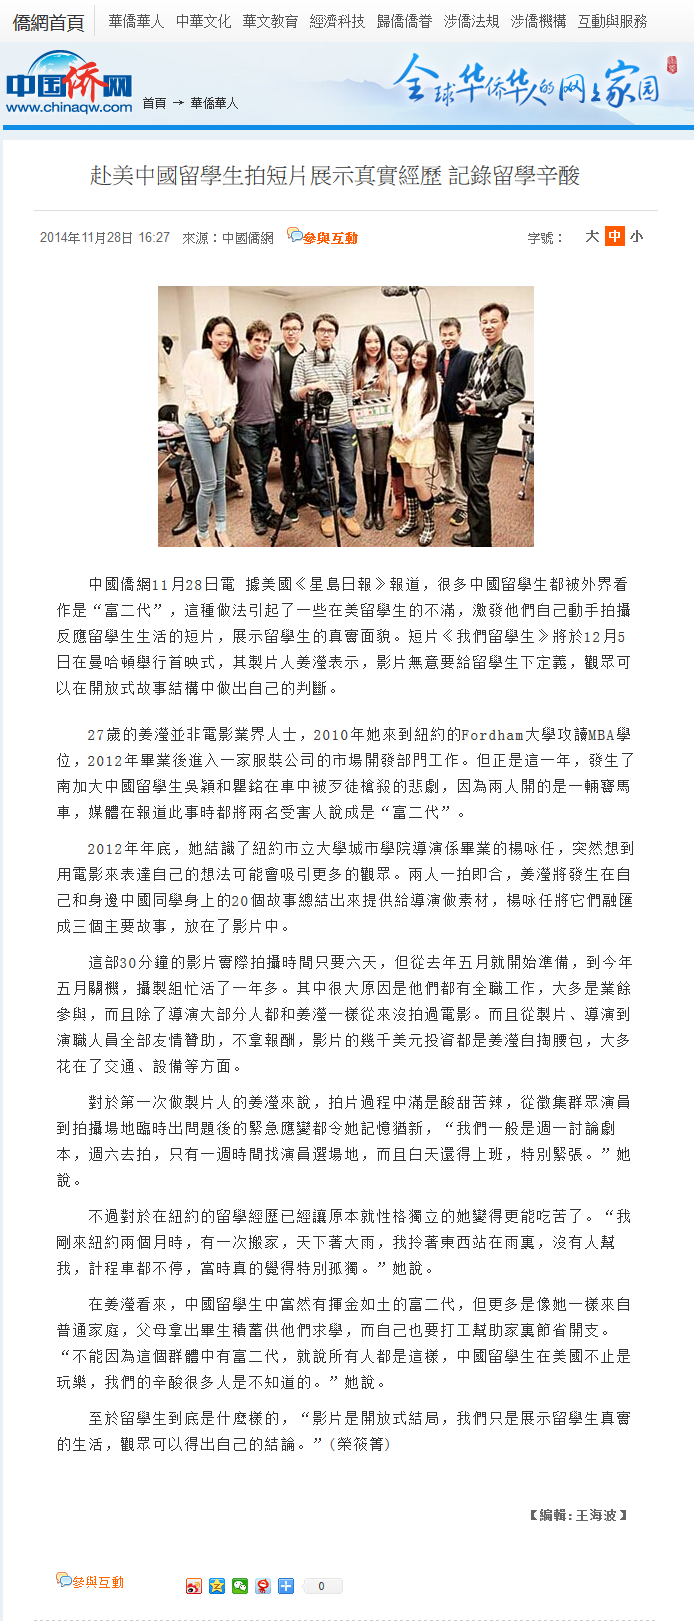 Chinaqw News 11.28 Report